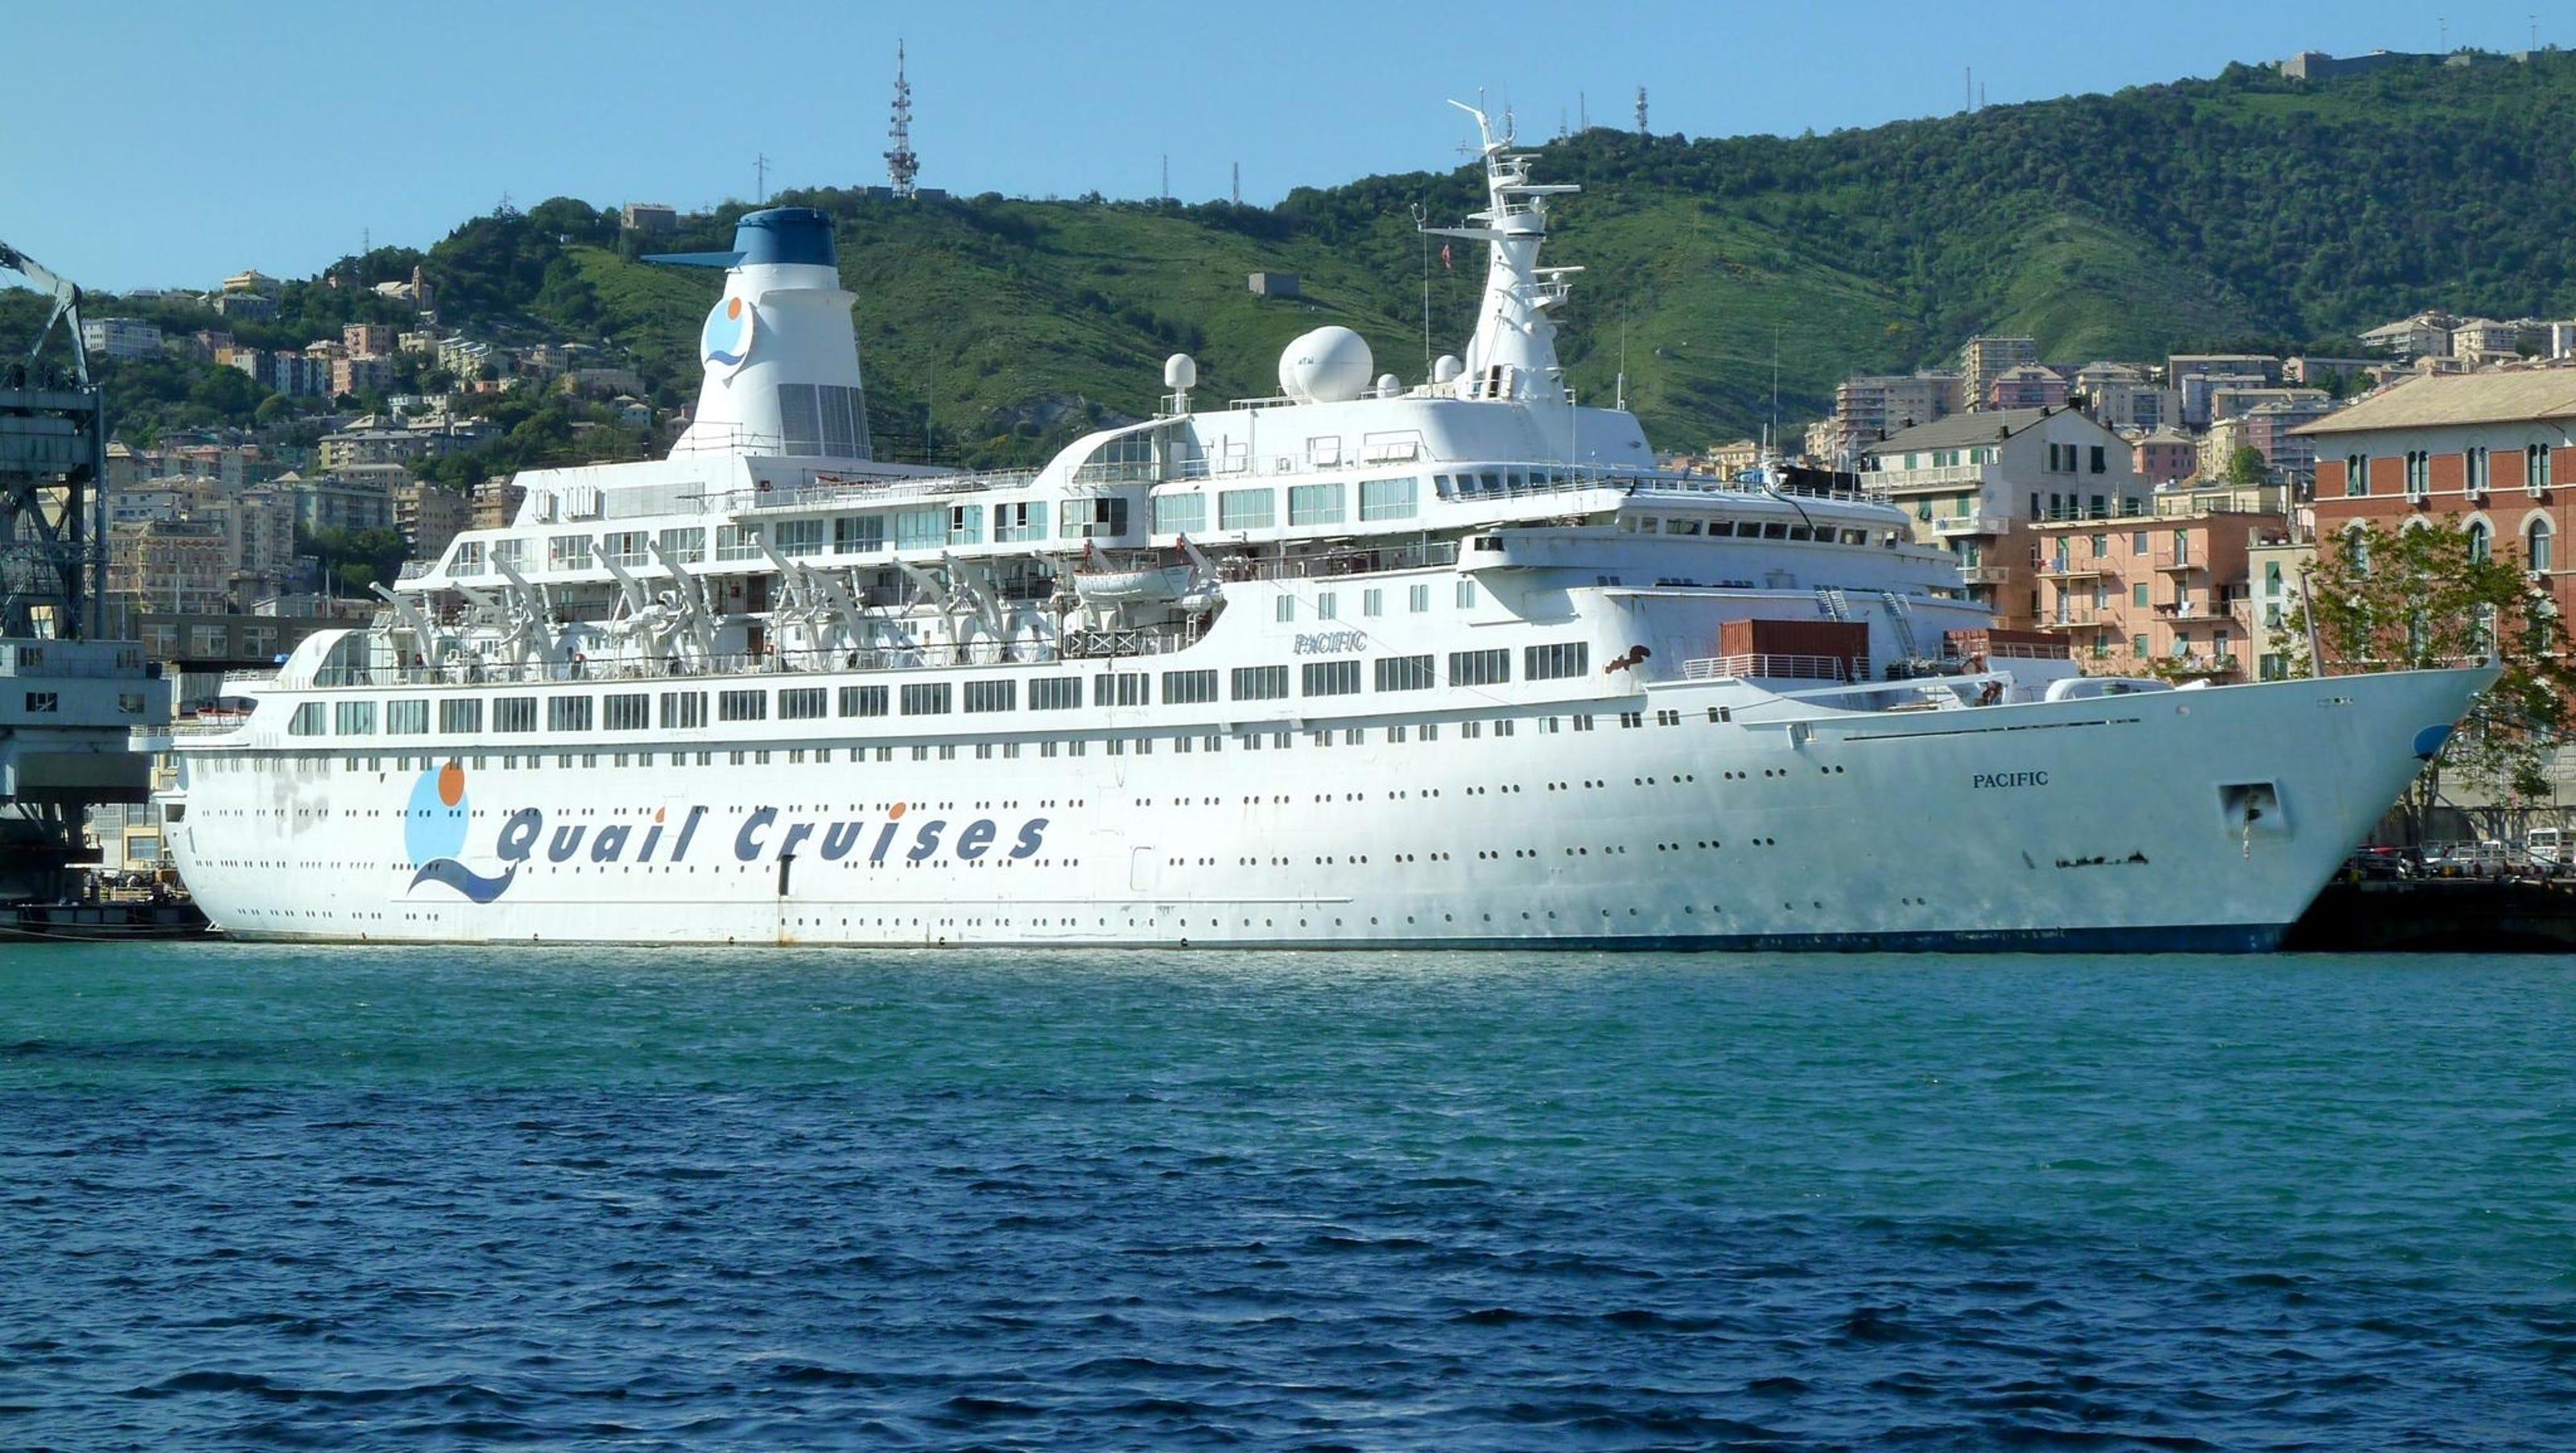 Famed Love Boat Makes Final Voyage To Scrapyard